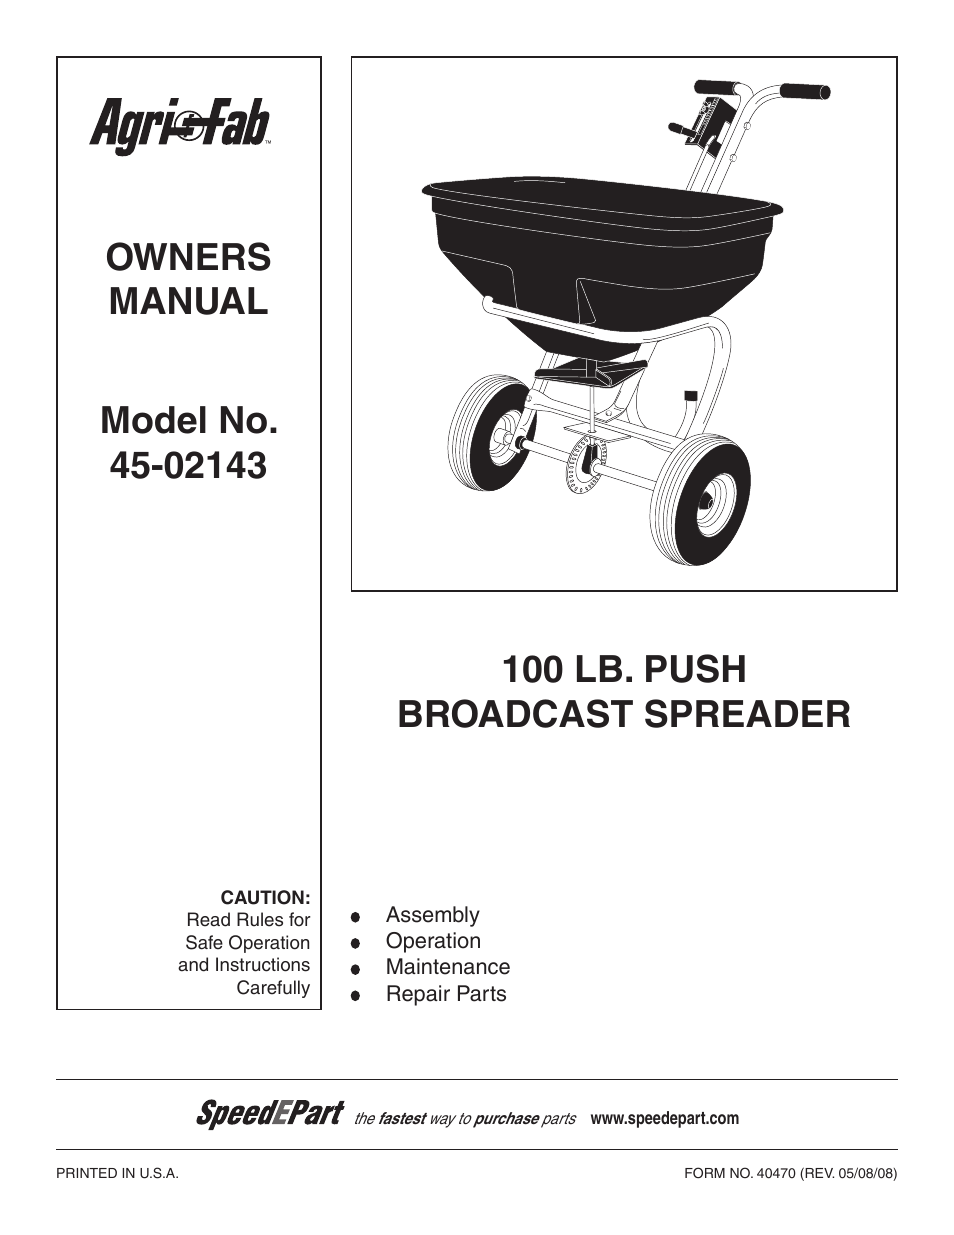 agri fab 45 02143 user manual 12 pages rh manualsdir com agri fab spreader 175 manual agri-fab broadcast spreader 125 manual